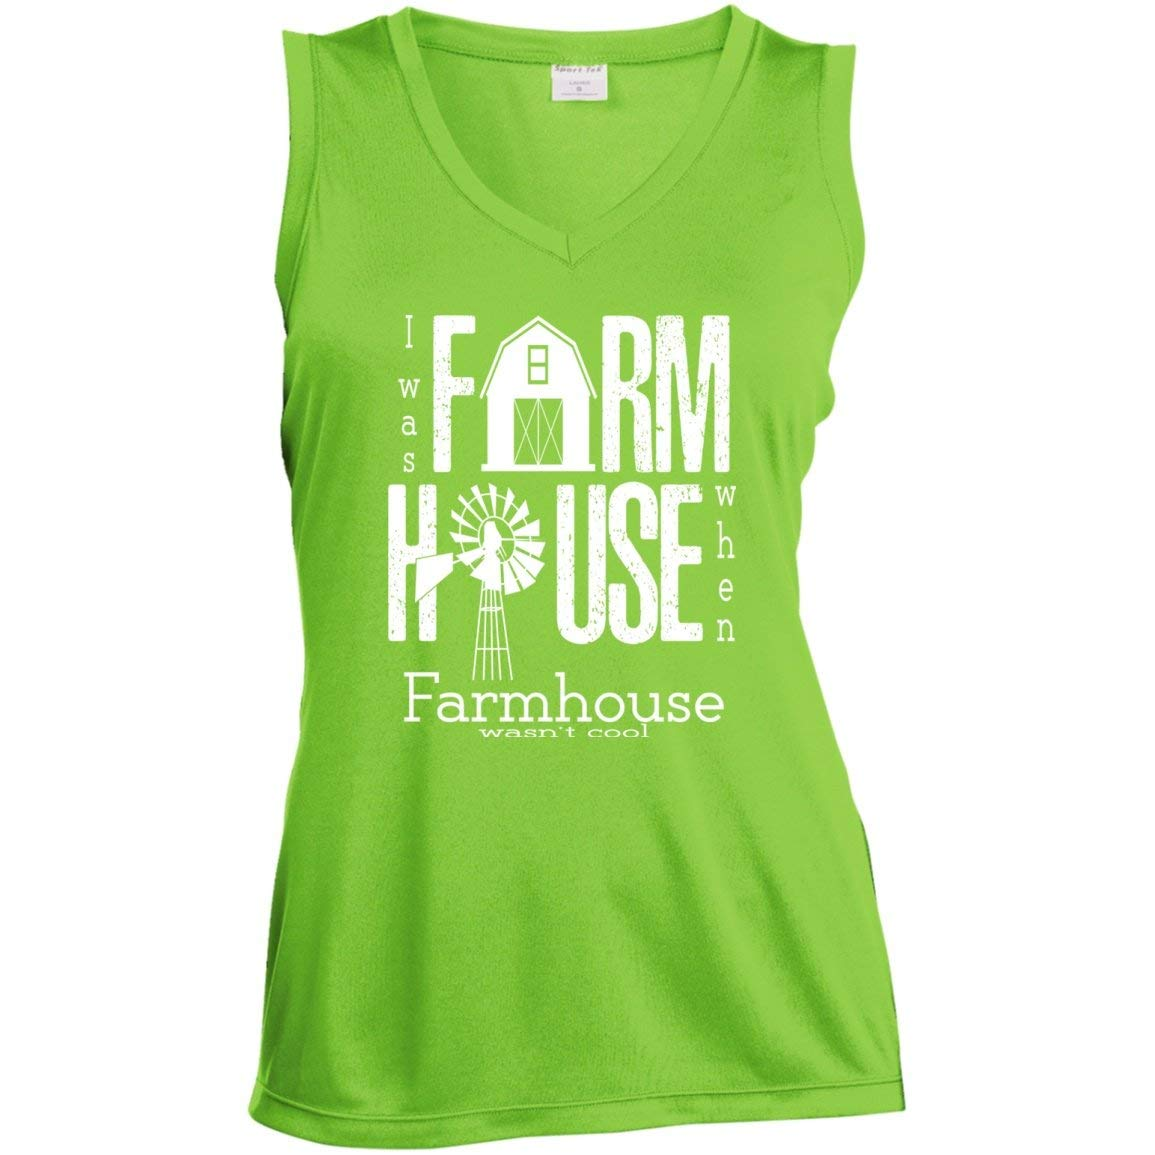 TXRepublic Farmhouse Ladies Sleeveless Moisture Absorbing V-Neck